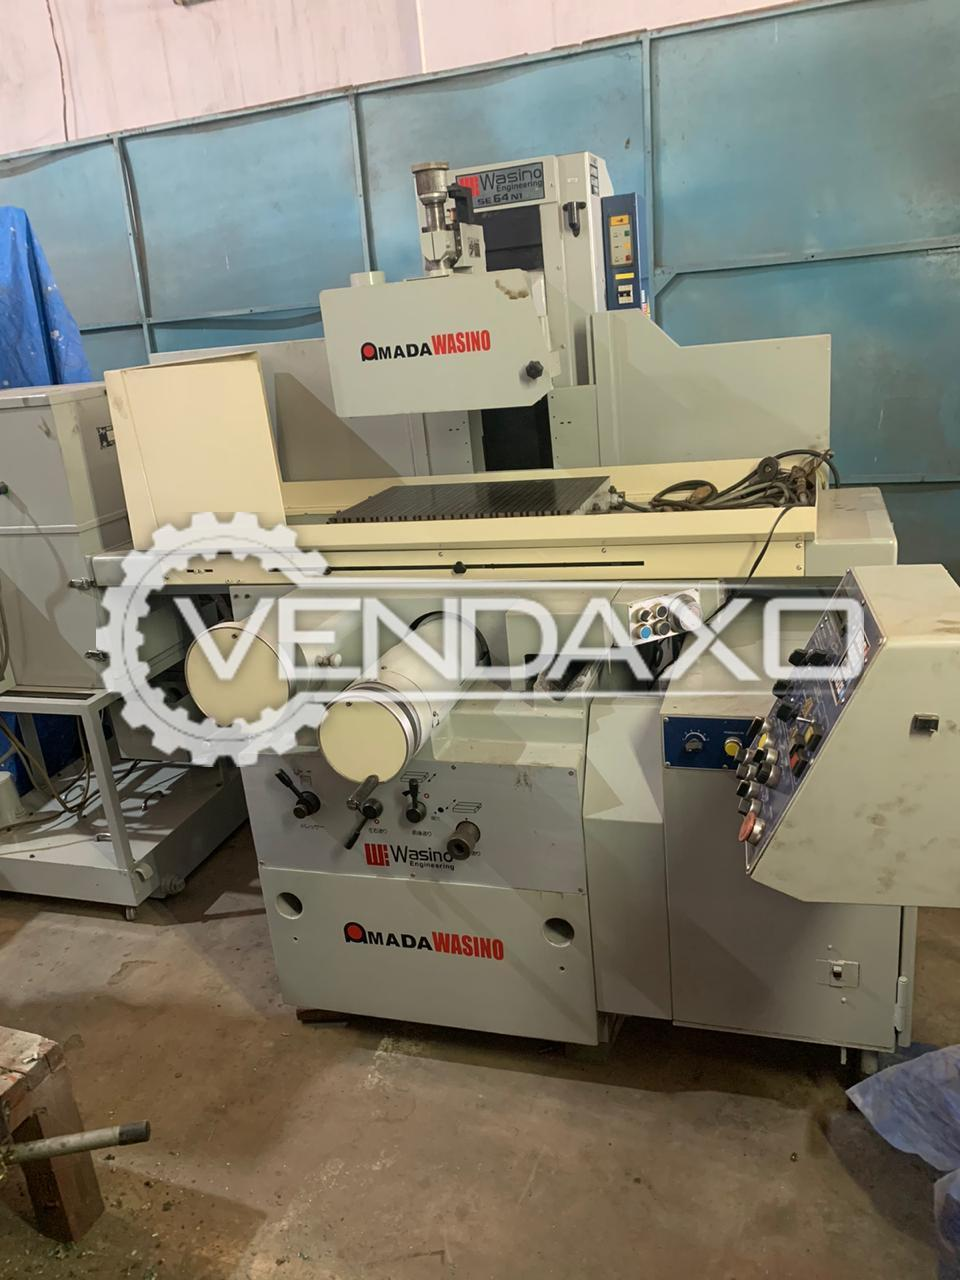 Amada Wasino Make Hydraulic NC Surface Grinding Machine - Table Size : 600 x 400 mm